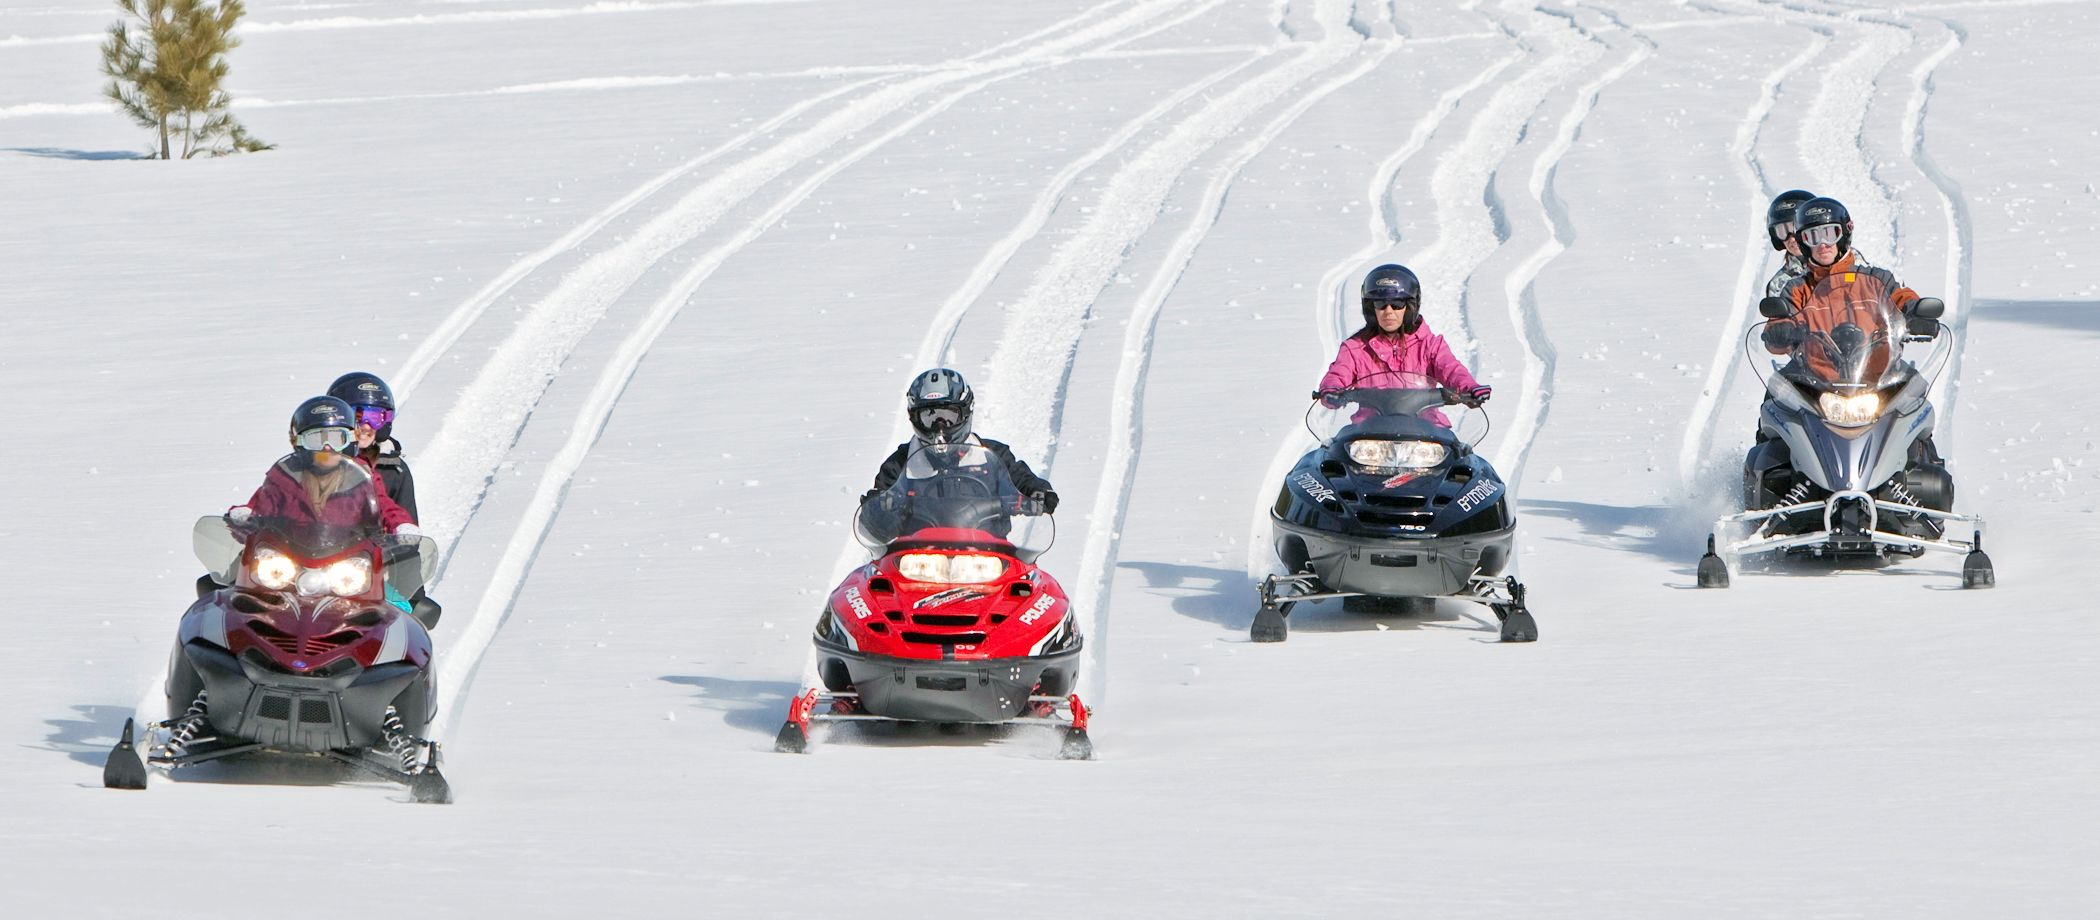 Schneemobil-Spass